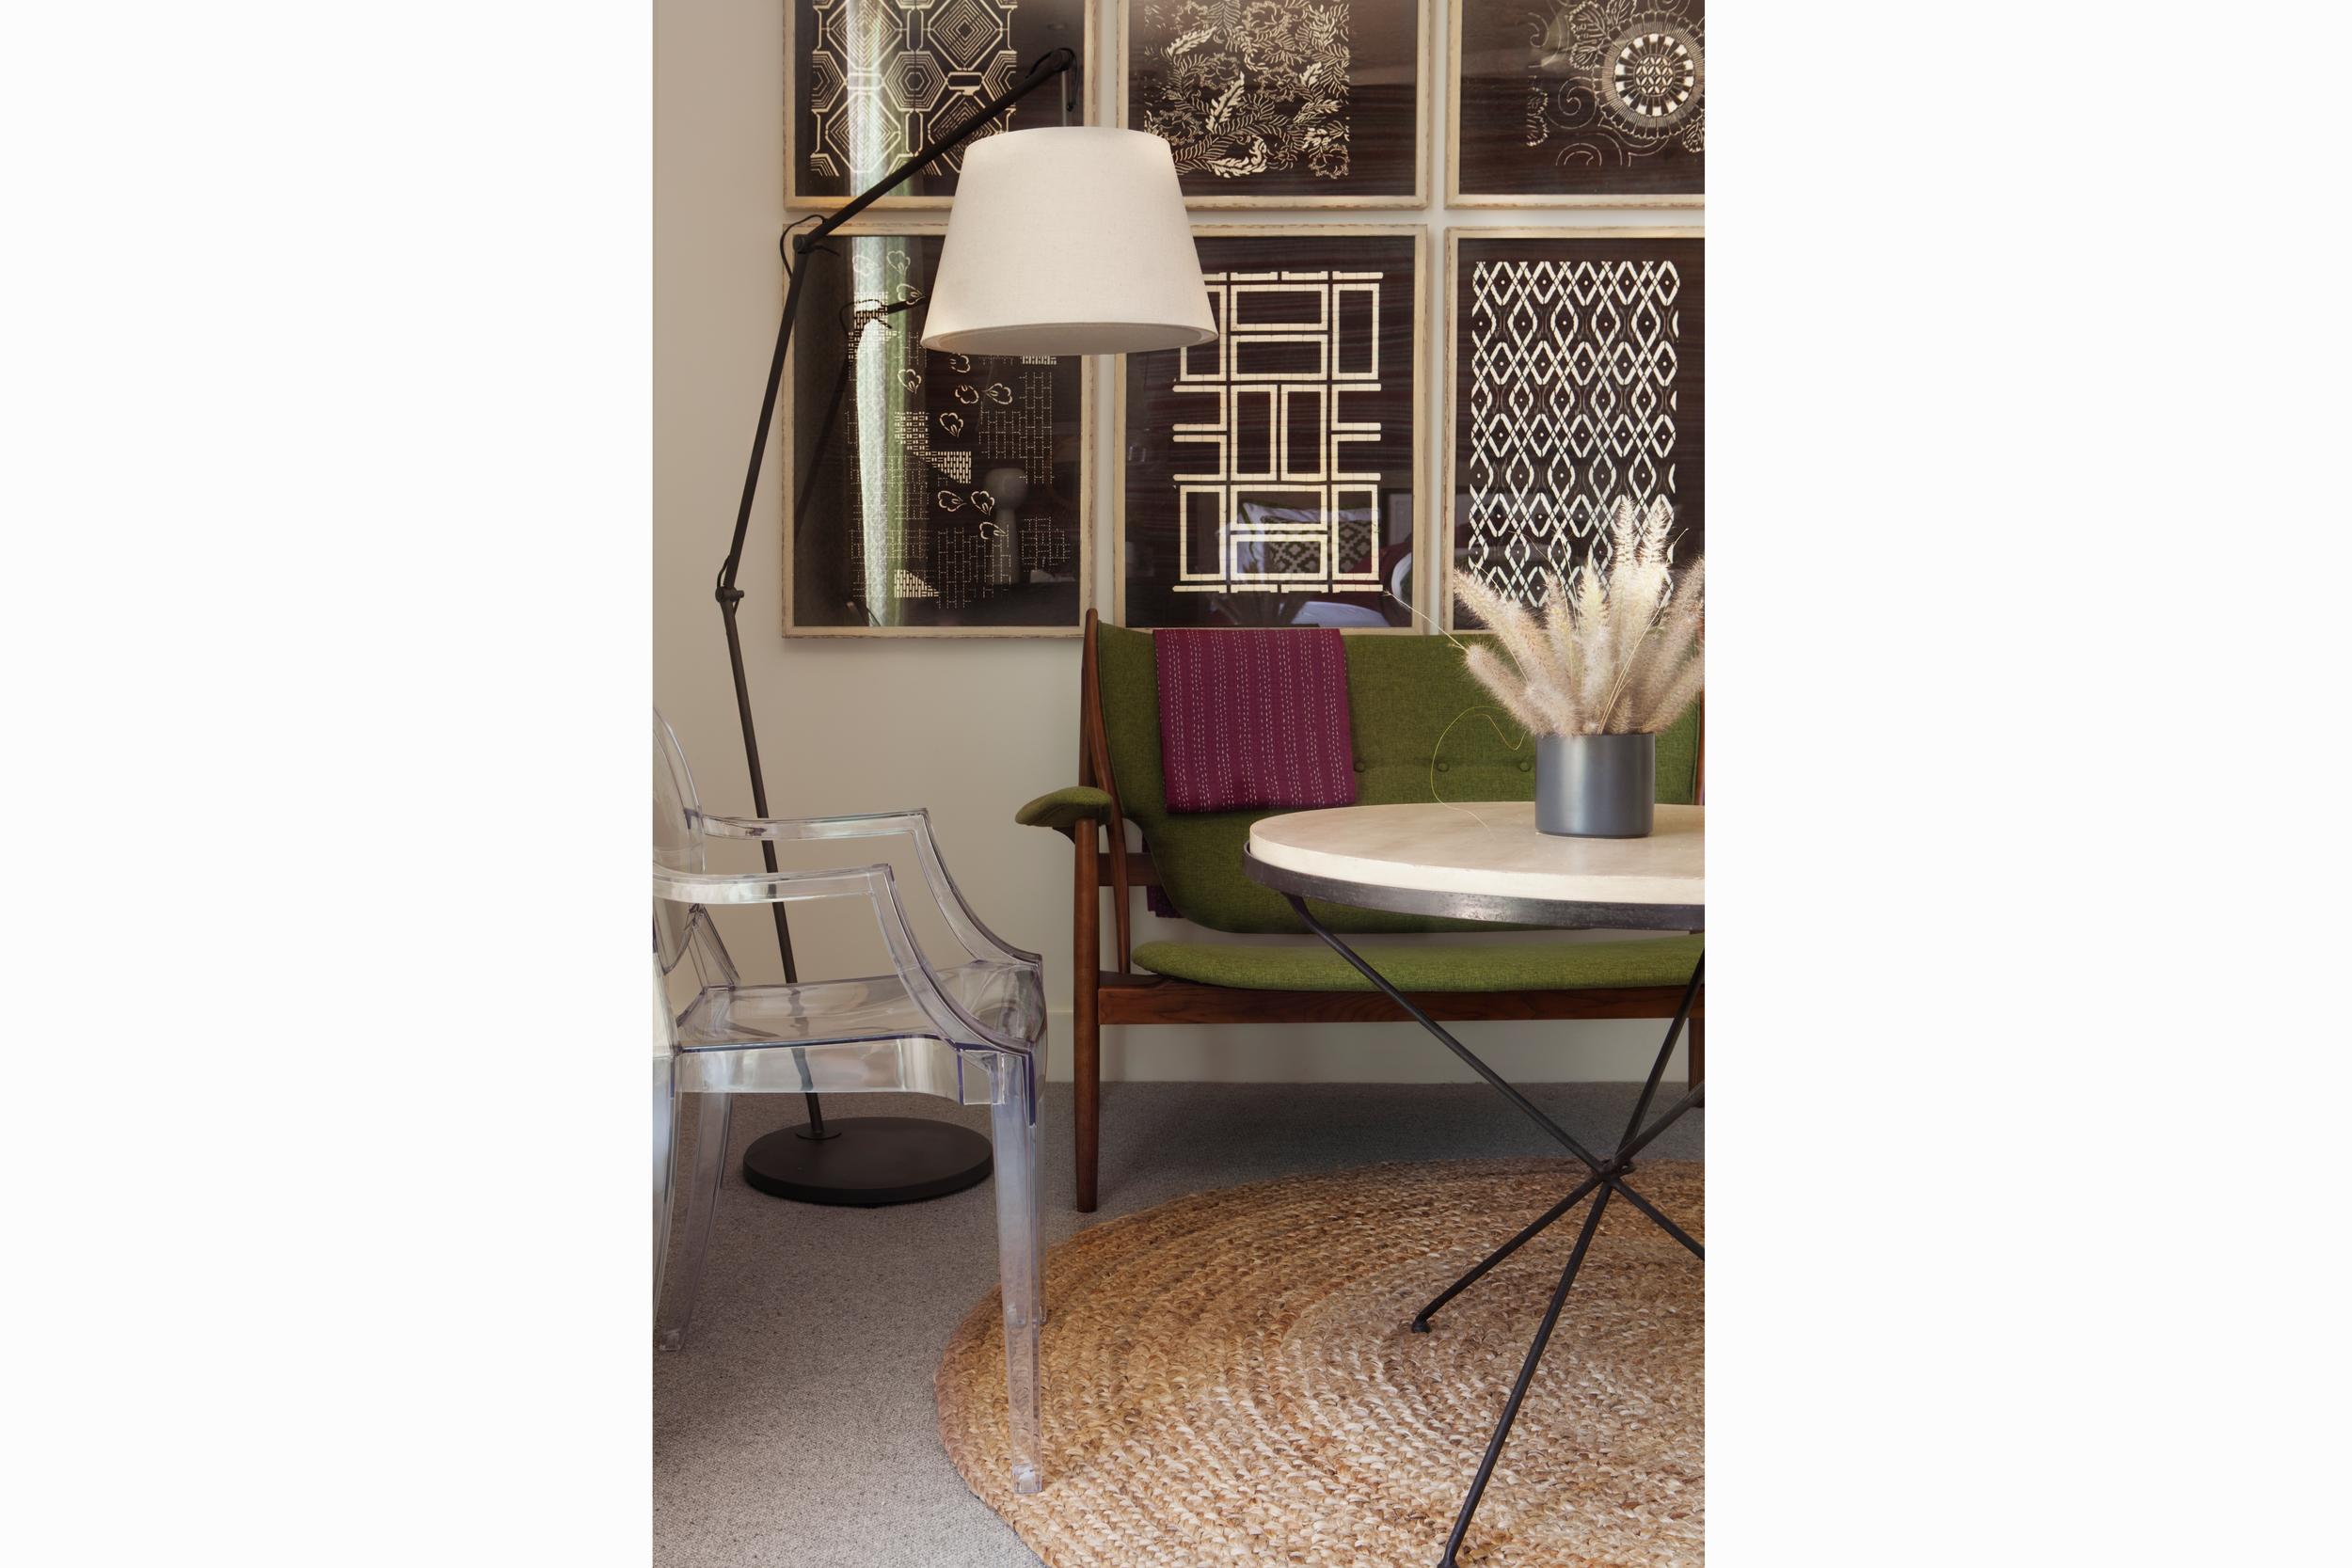 brittany stiles interior design green mid century modern sofa ghost chair orange county interior design.png